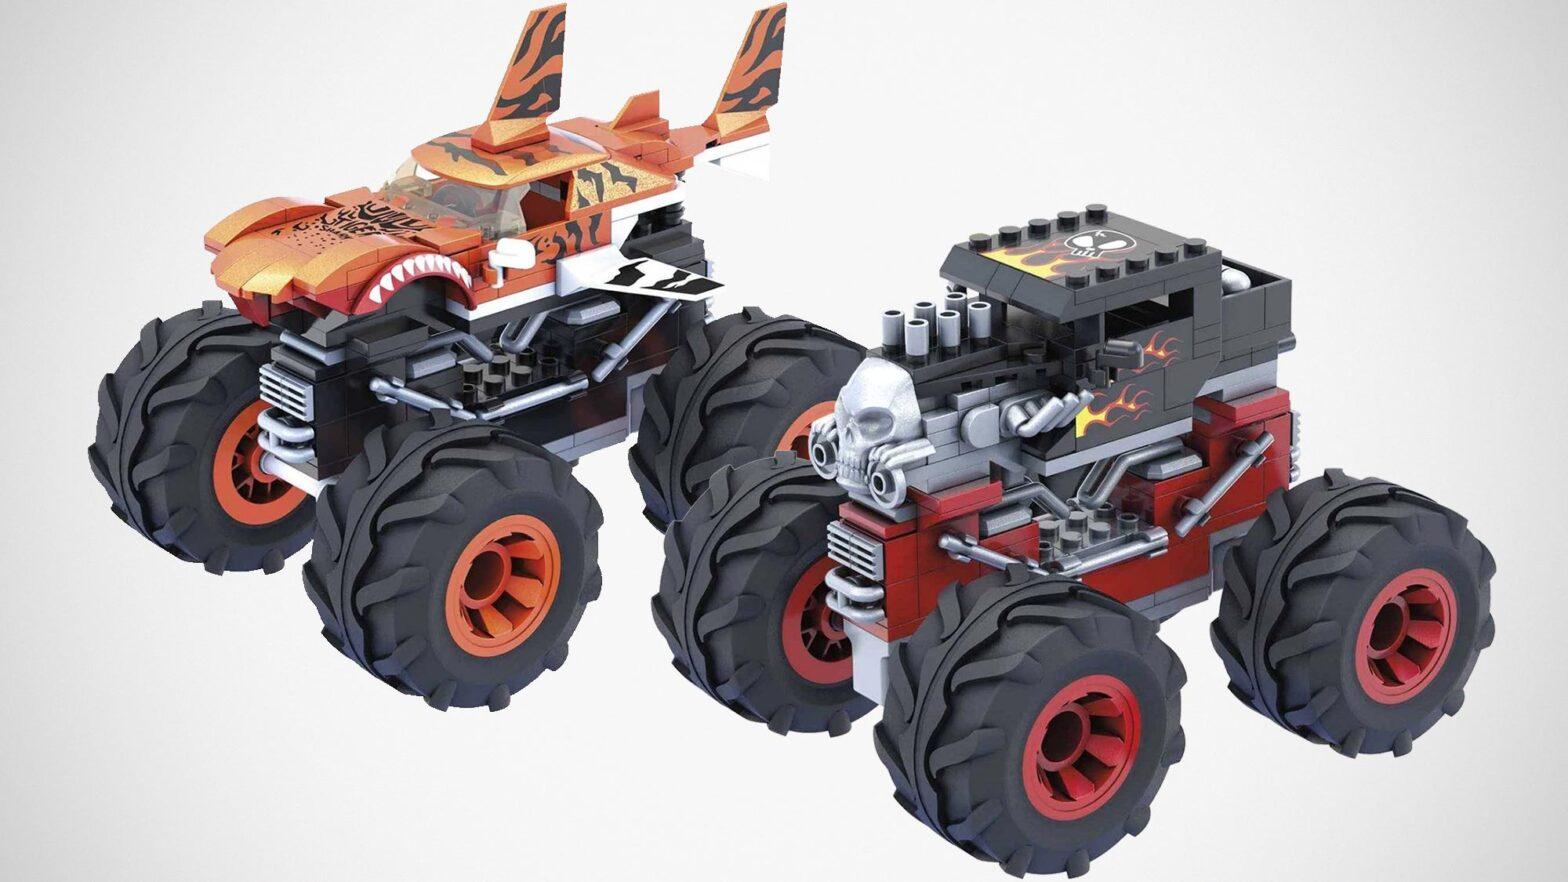 Mega Hot Wheels Monster Trucks Building Sets